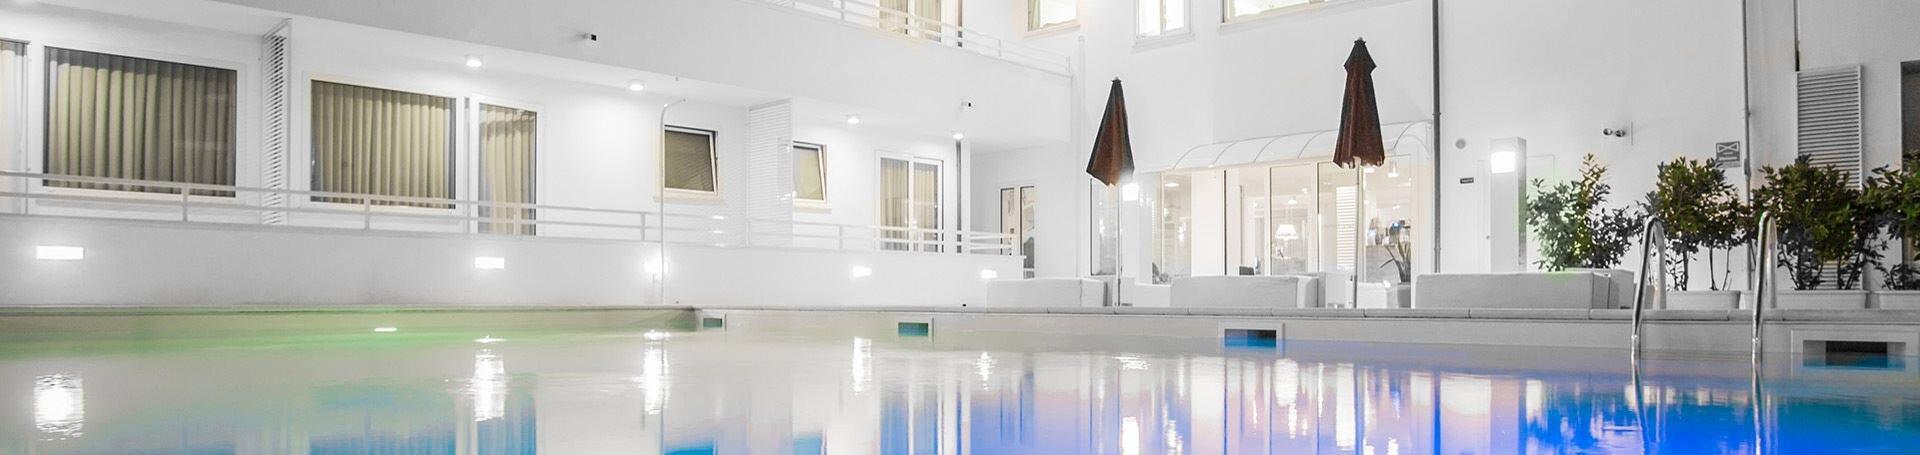 hotelmokambo fr hotel-cesenatico-avec-piscine 009